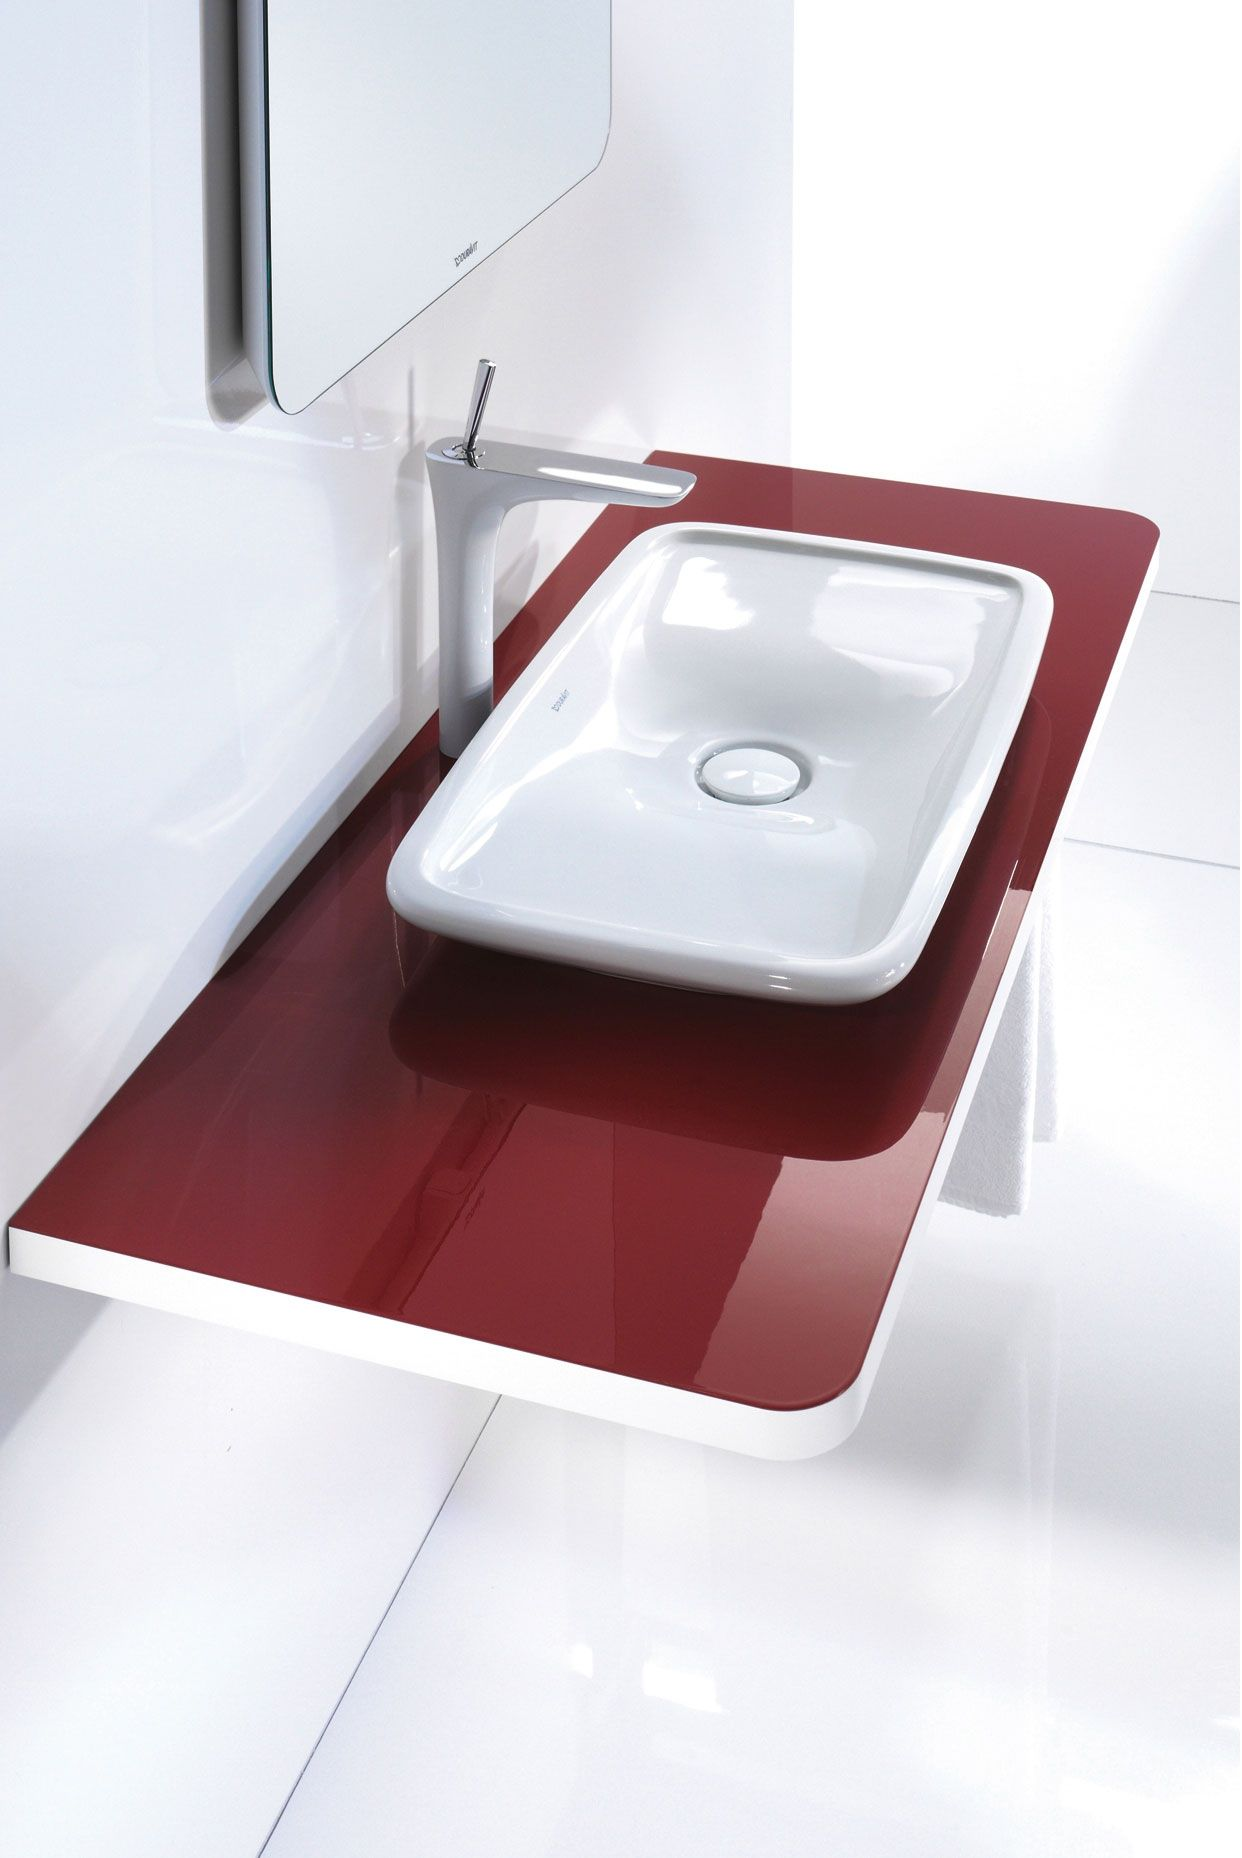 Perfect Duravitu0027s Puravida Furniture Basin #beautifulbasins #duravit #cphart